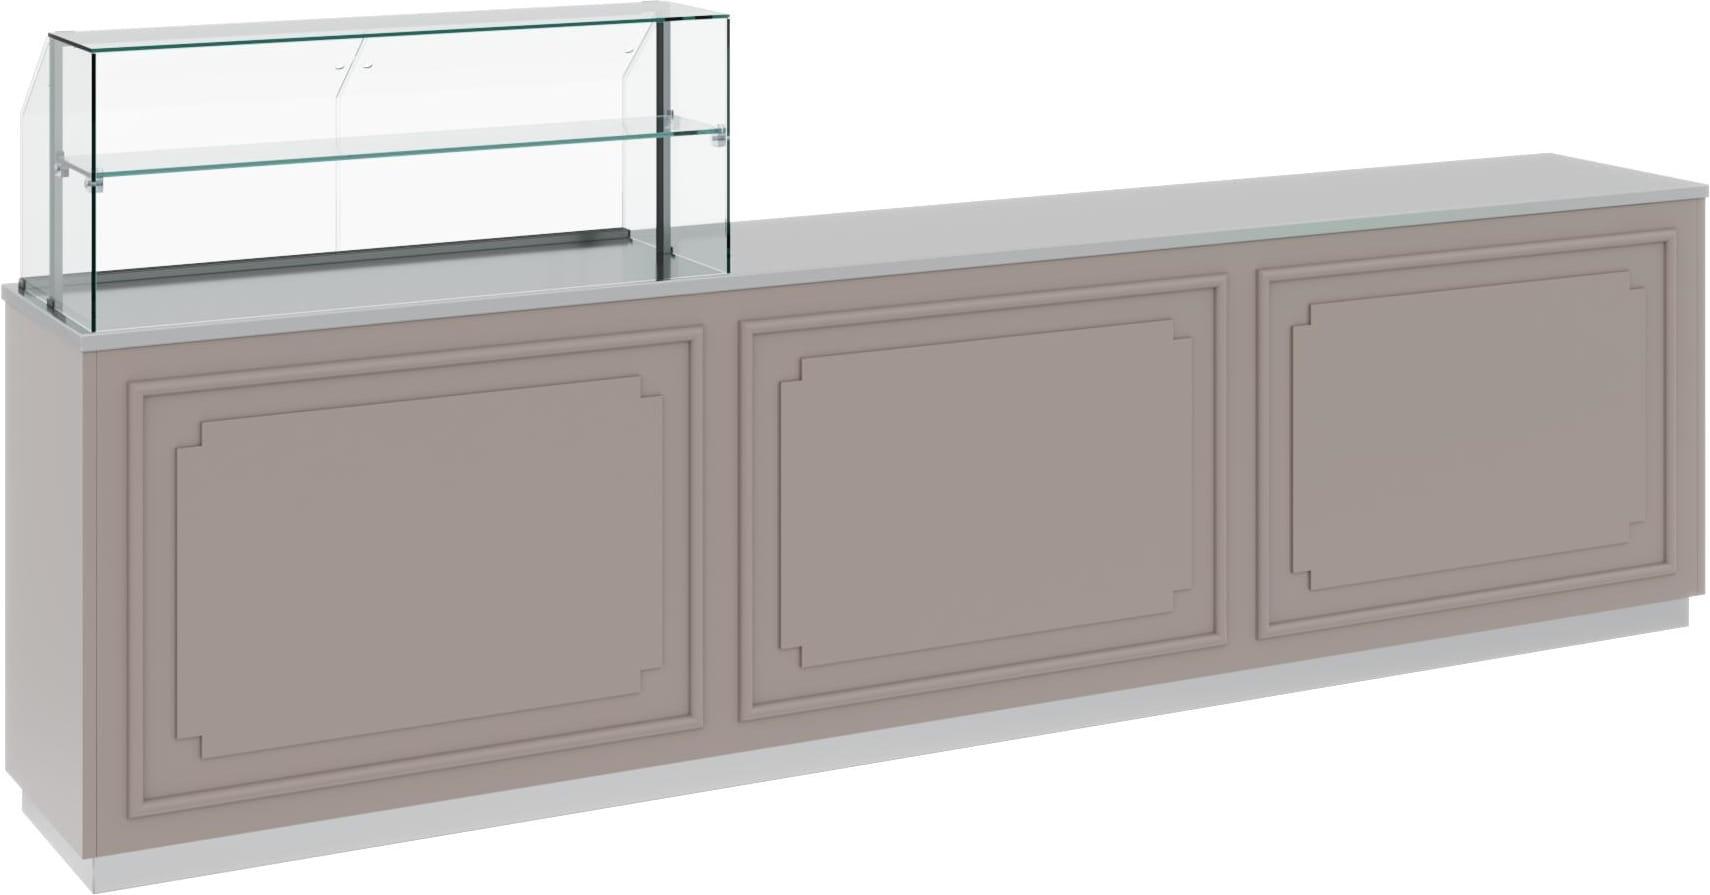 Нейтральная витрина CARBOMA AC40N 1.75-11 - 1